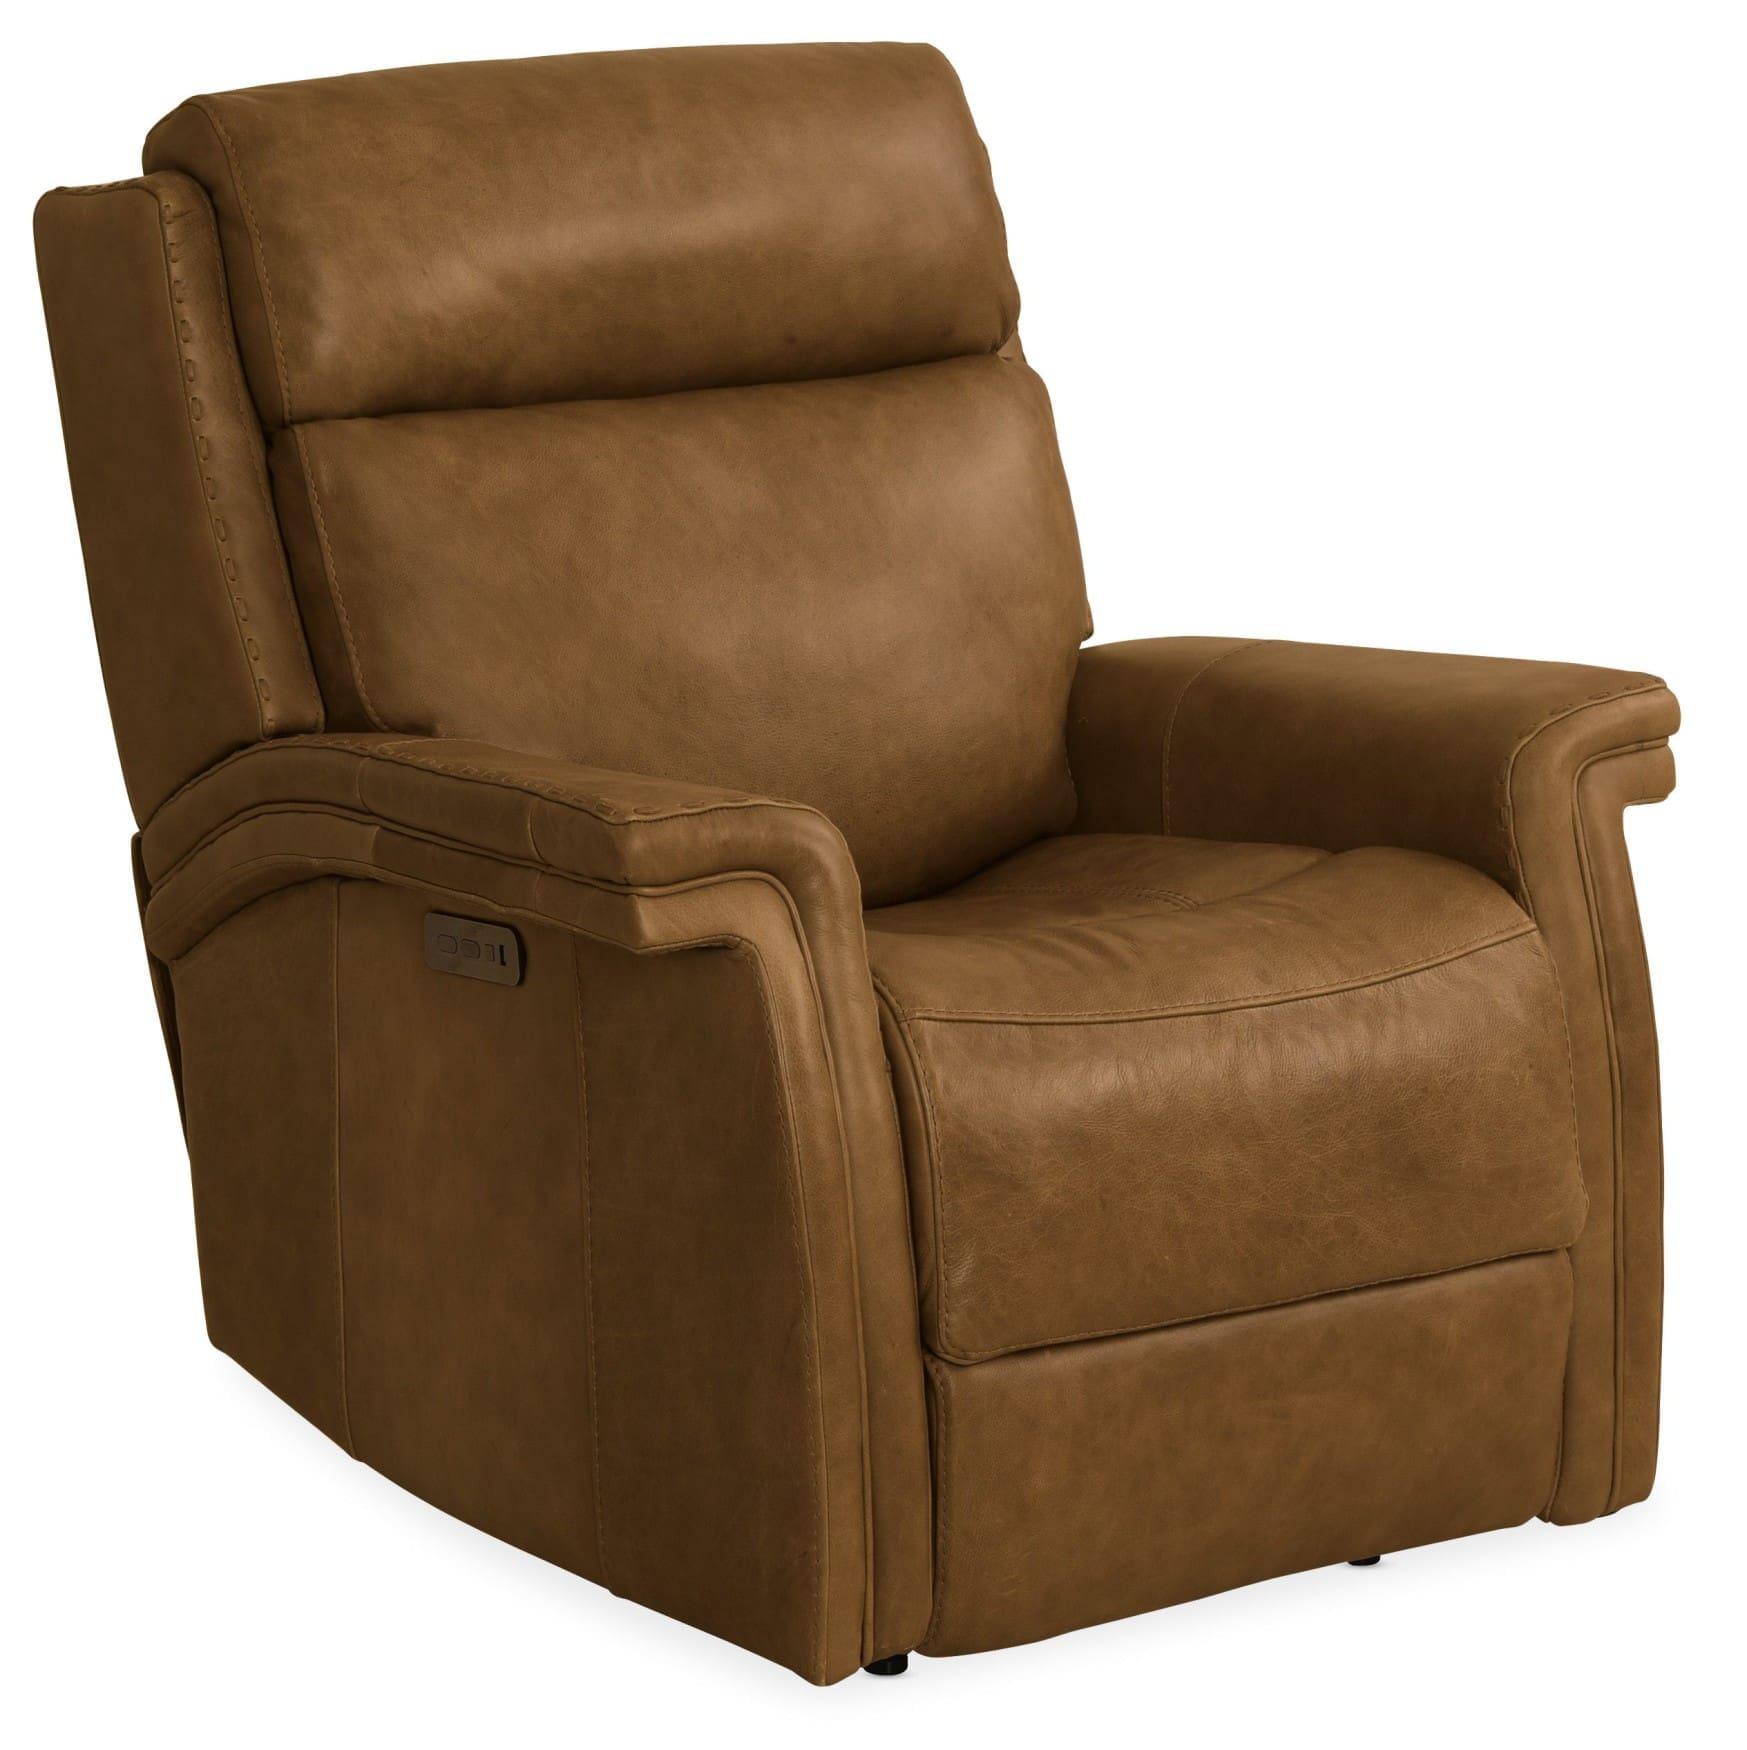 Poise Power Recliner w/ Power Headrest